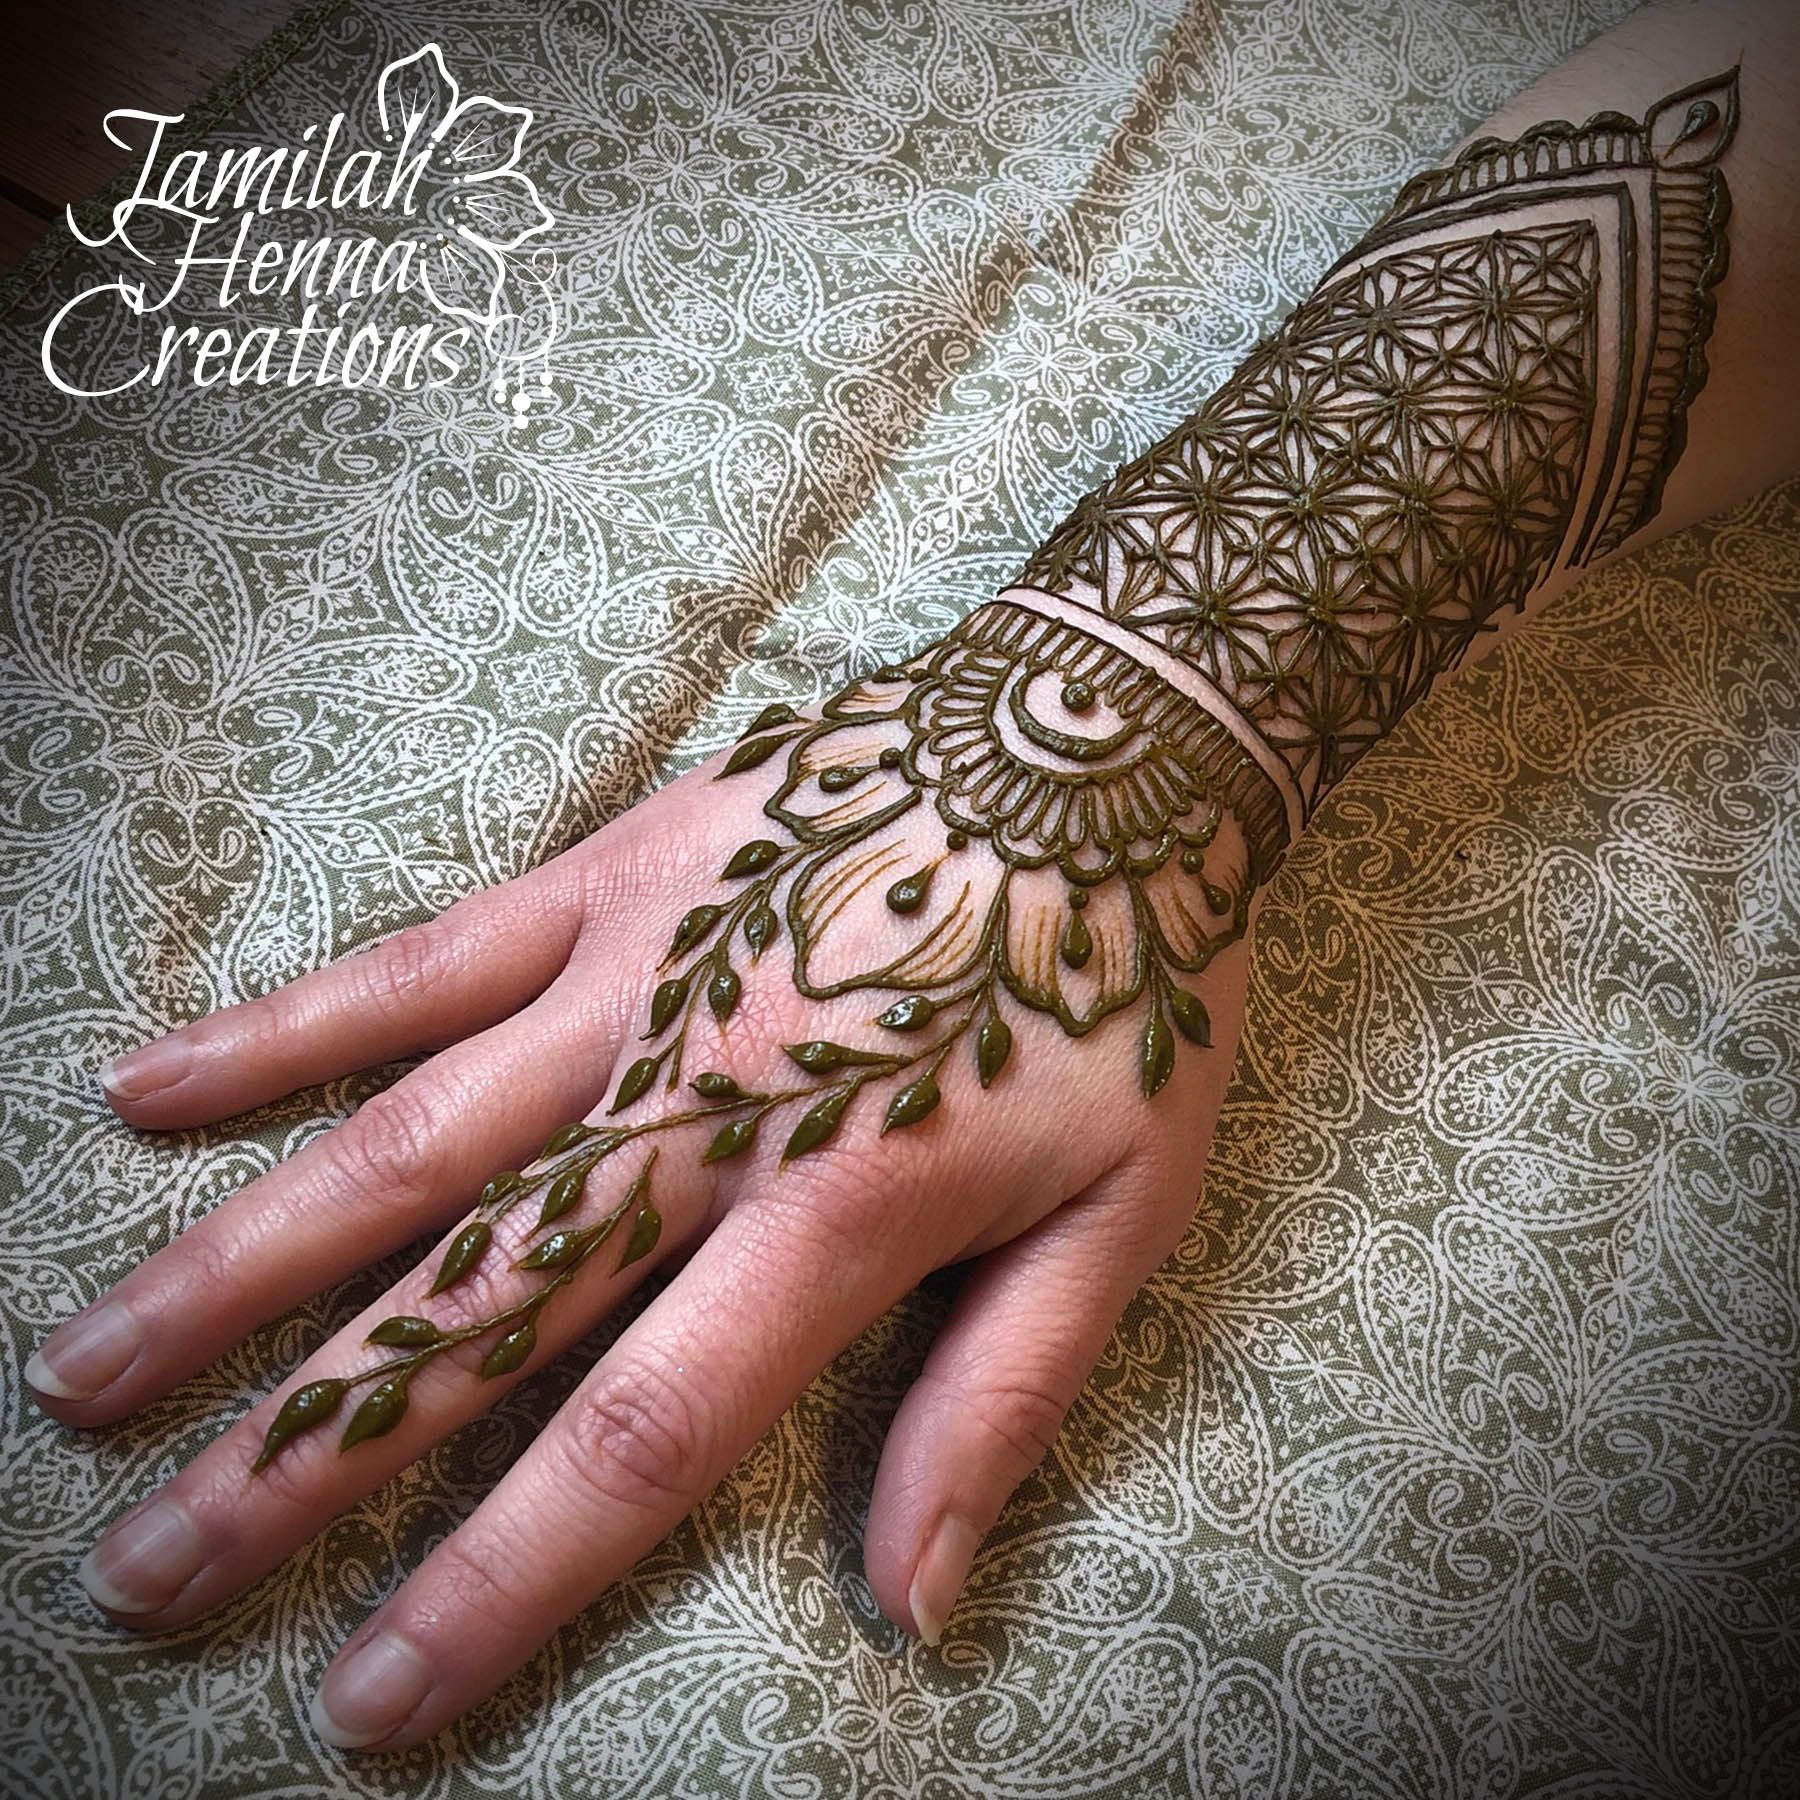 Henna Cuff Www Jamilahhennacreations Com: Warrior Cuff Zentangle Flower Henna Www